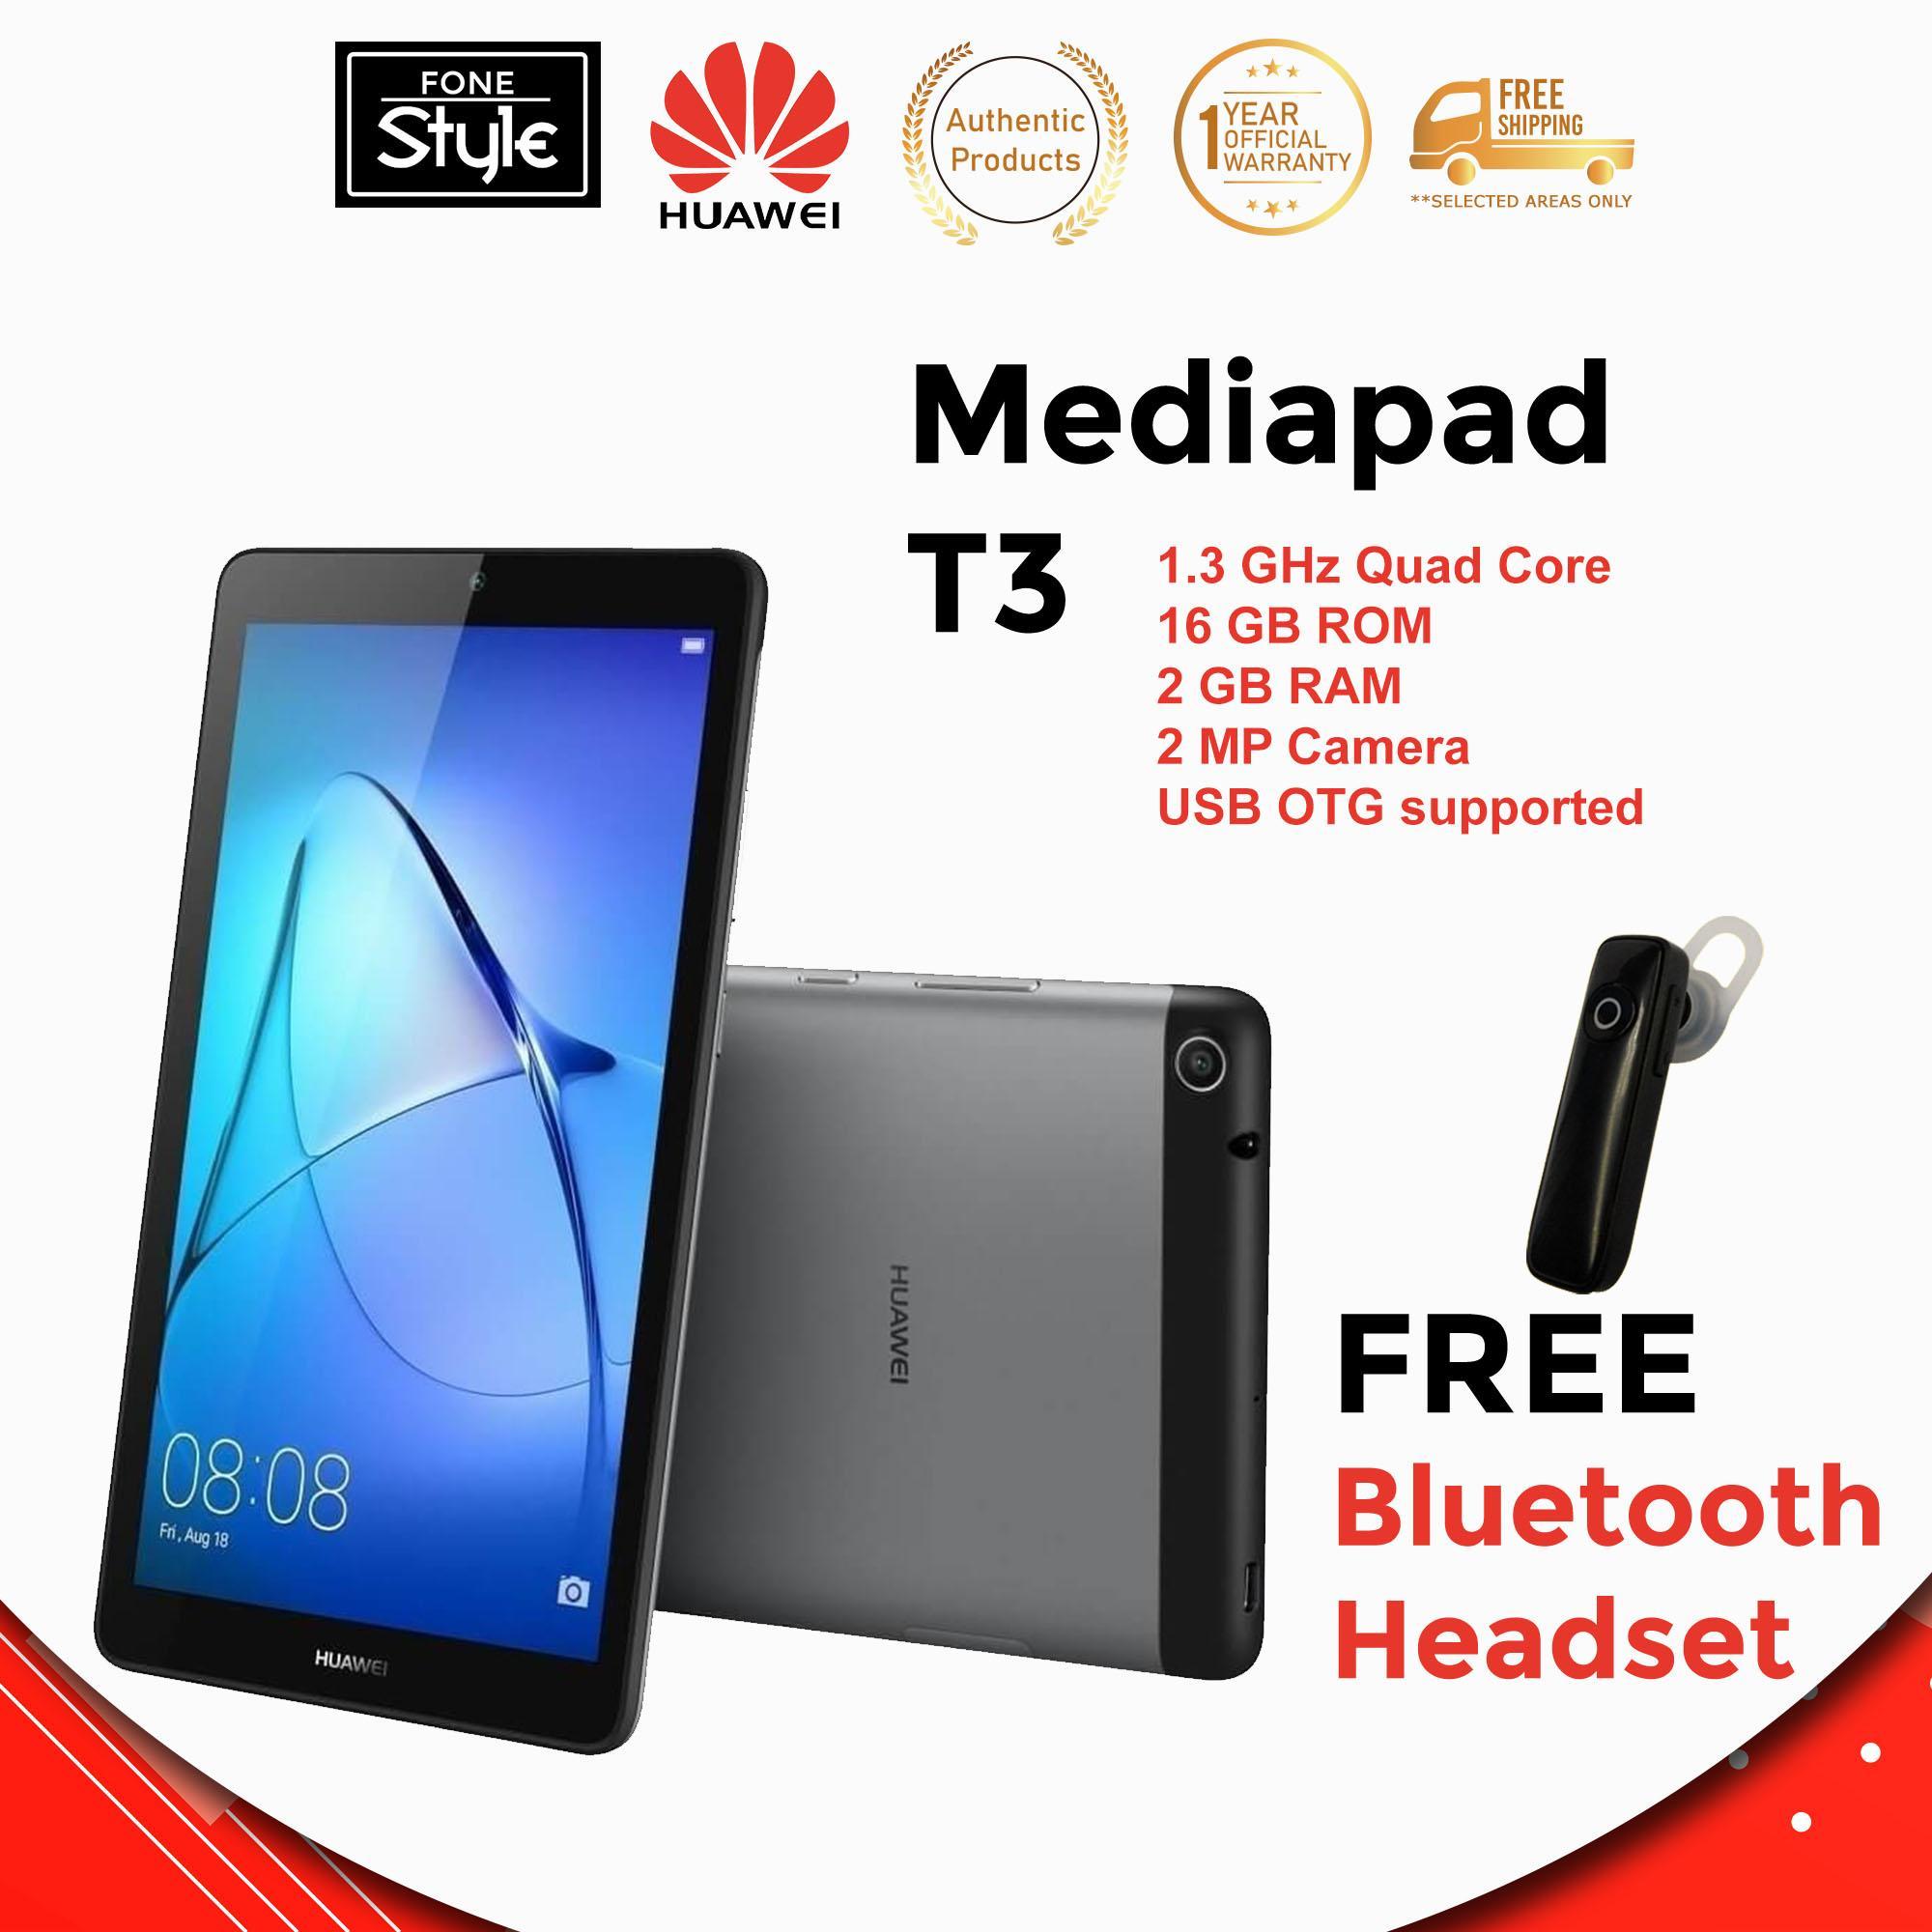 Huawei Philippines: Huawei price list - Huawei Phones, Tablet & WiFi